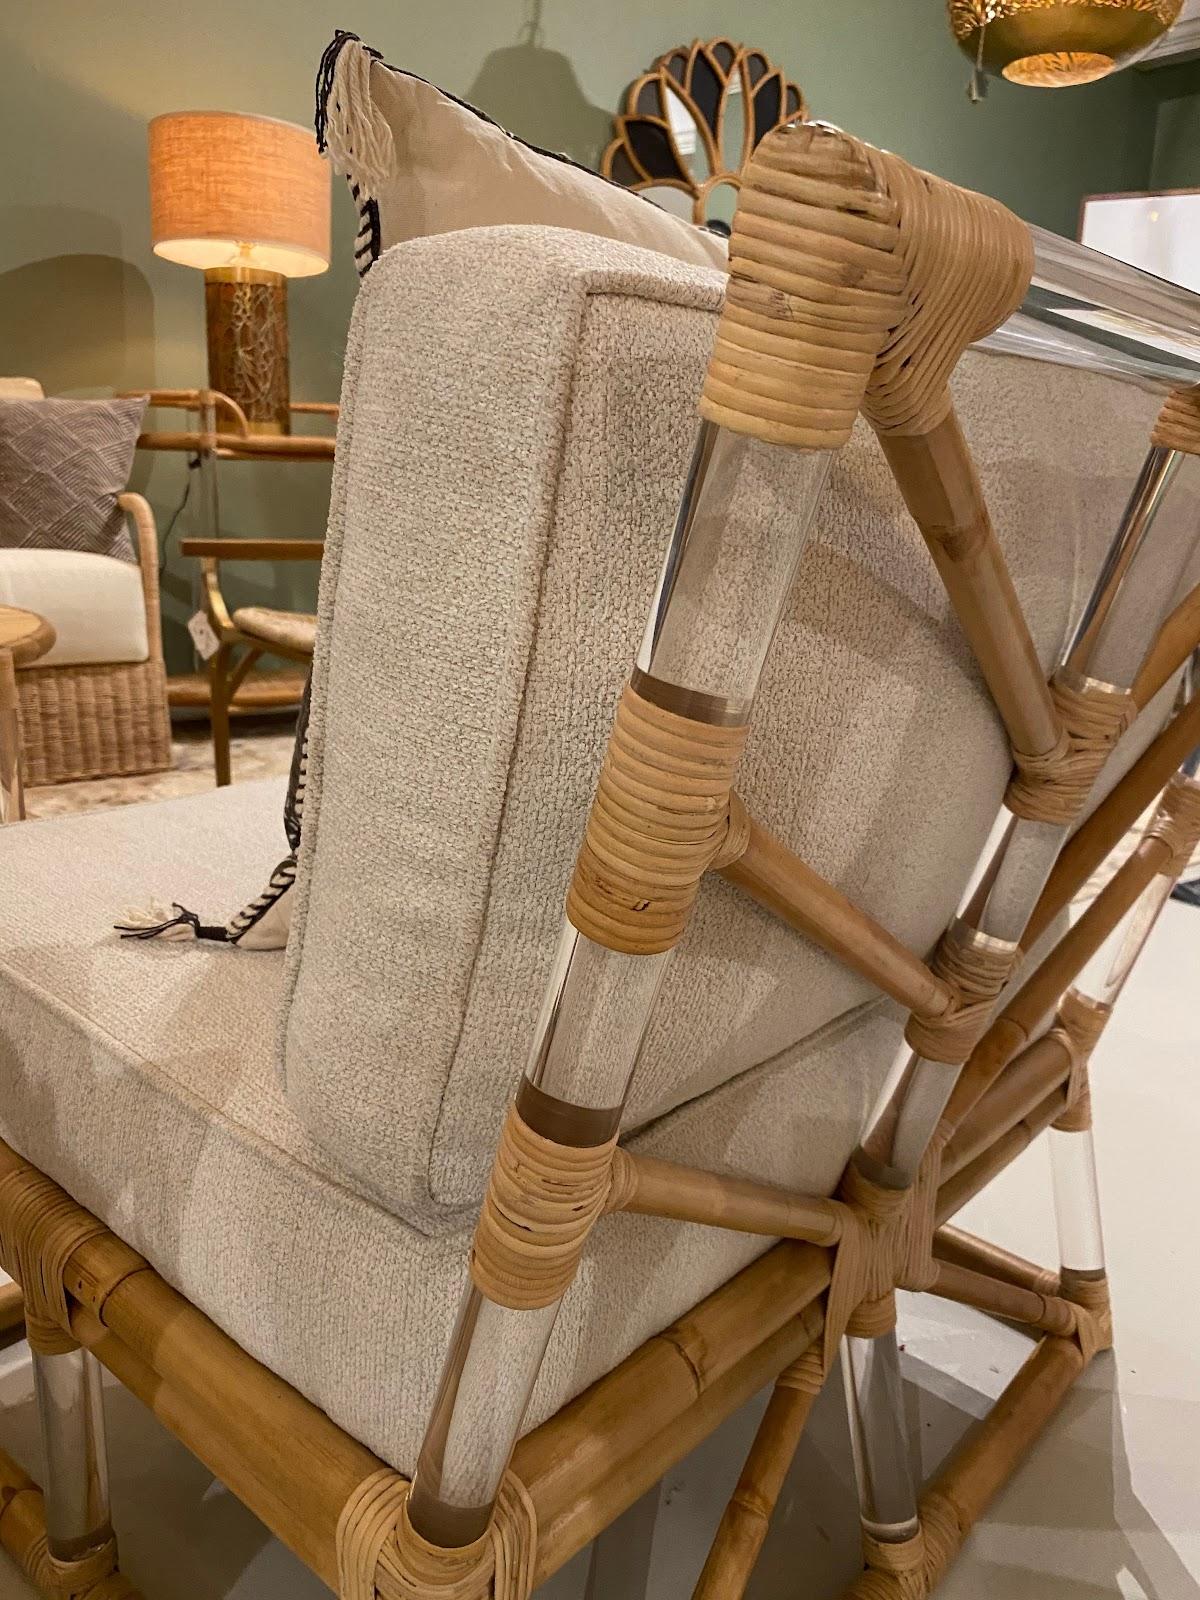 latest trends in interior design 2021 home decor natural wood cozy fabrics